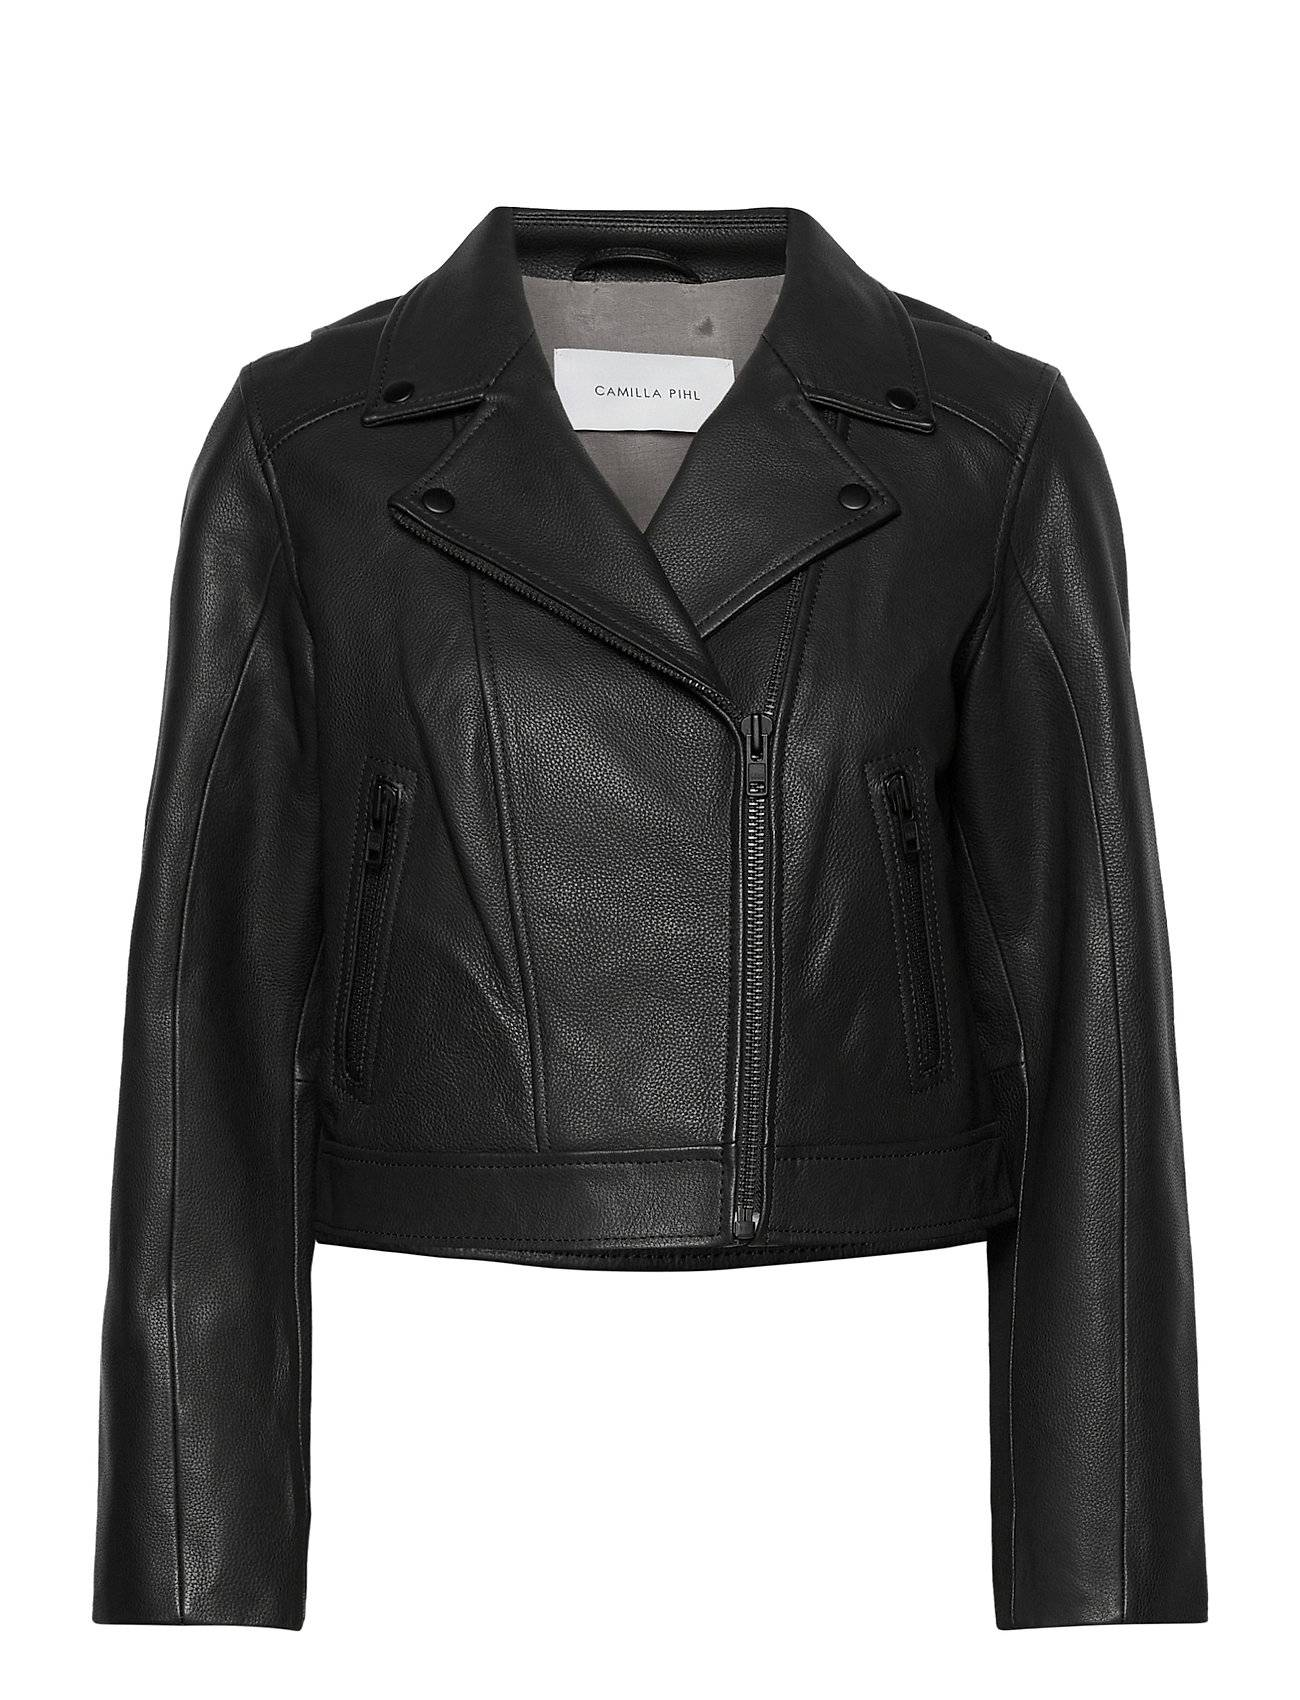 Camilla Pihl Soho Leather Jacket Nahkatakki Musta Camilla Pihl